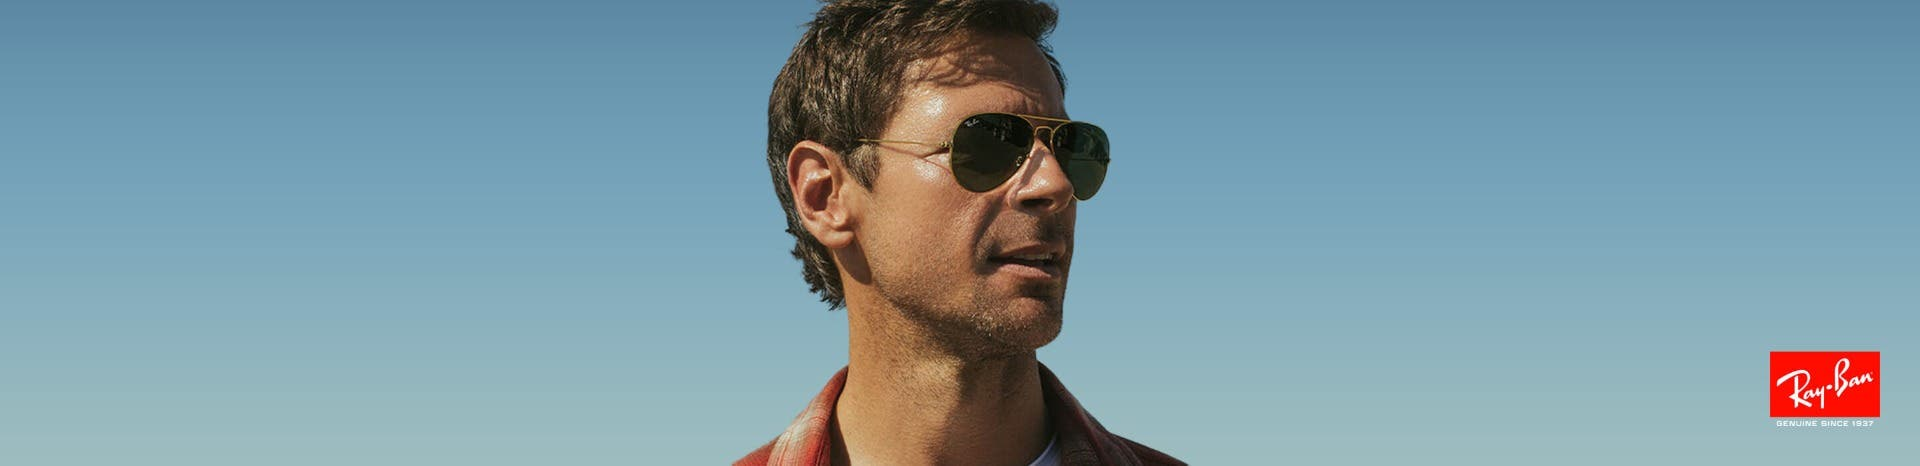 ray ban driving sunglasses prescription driving sunglasses